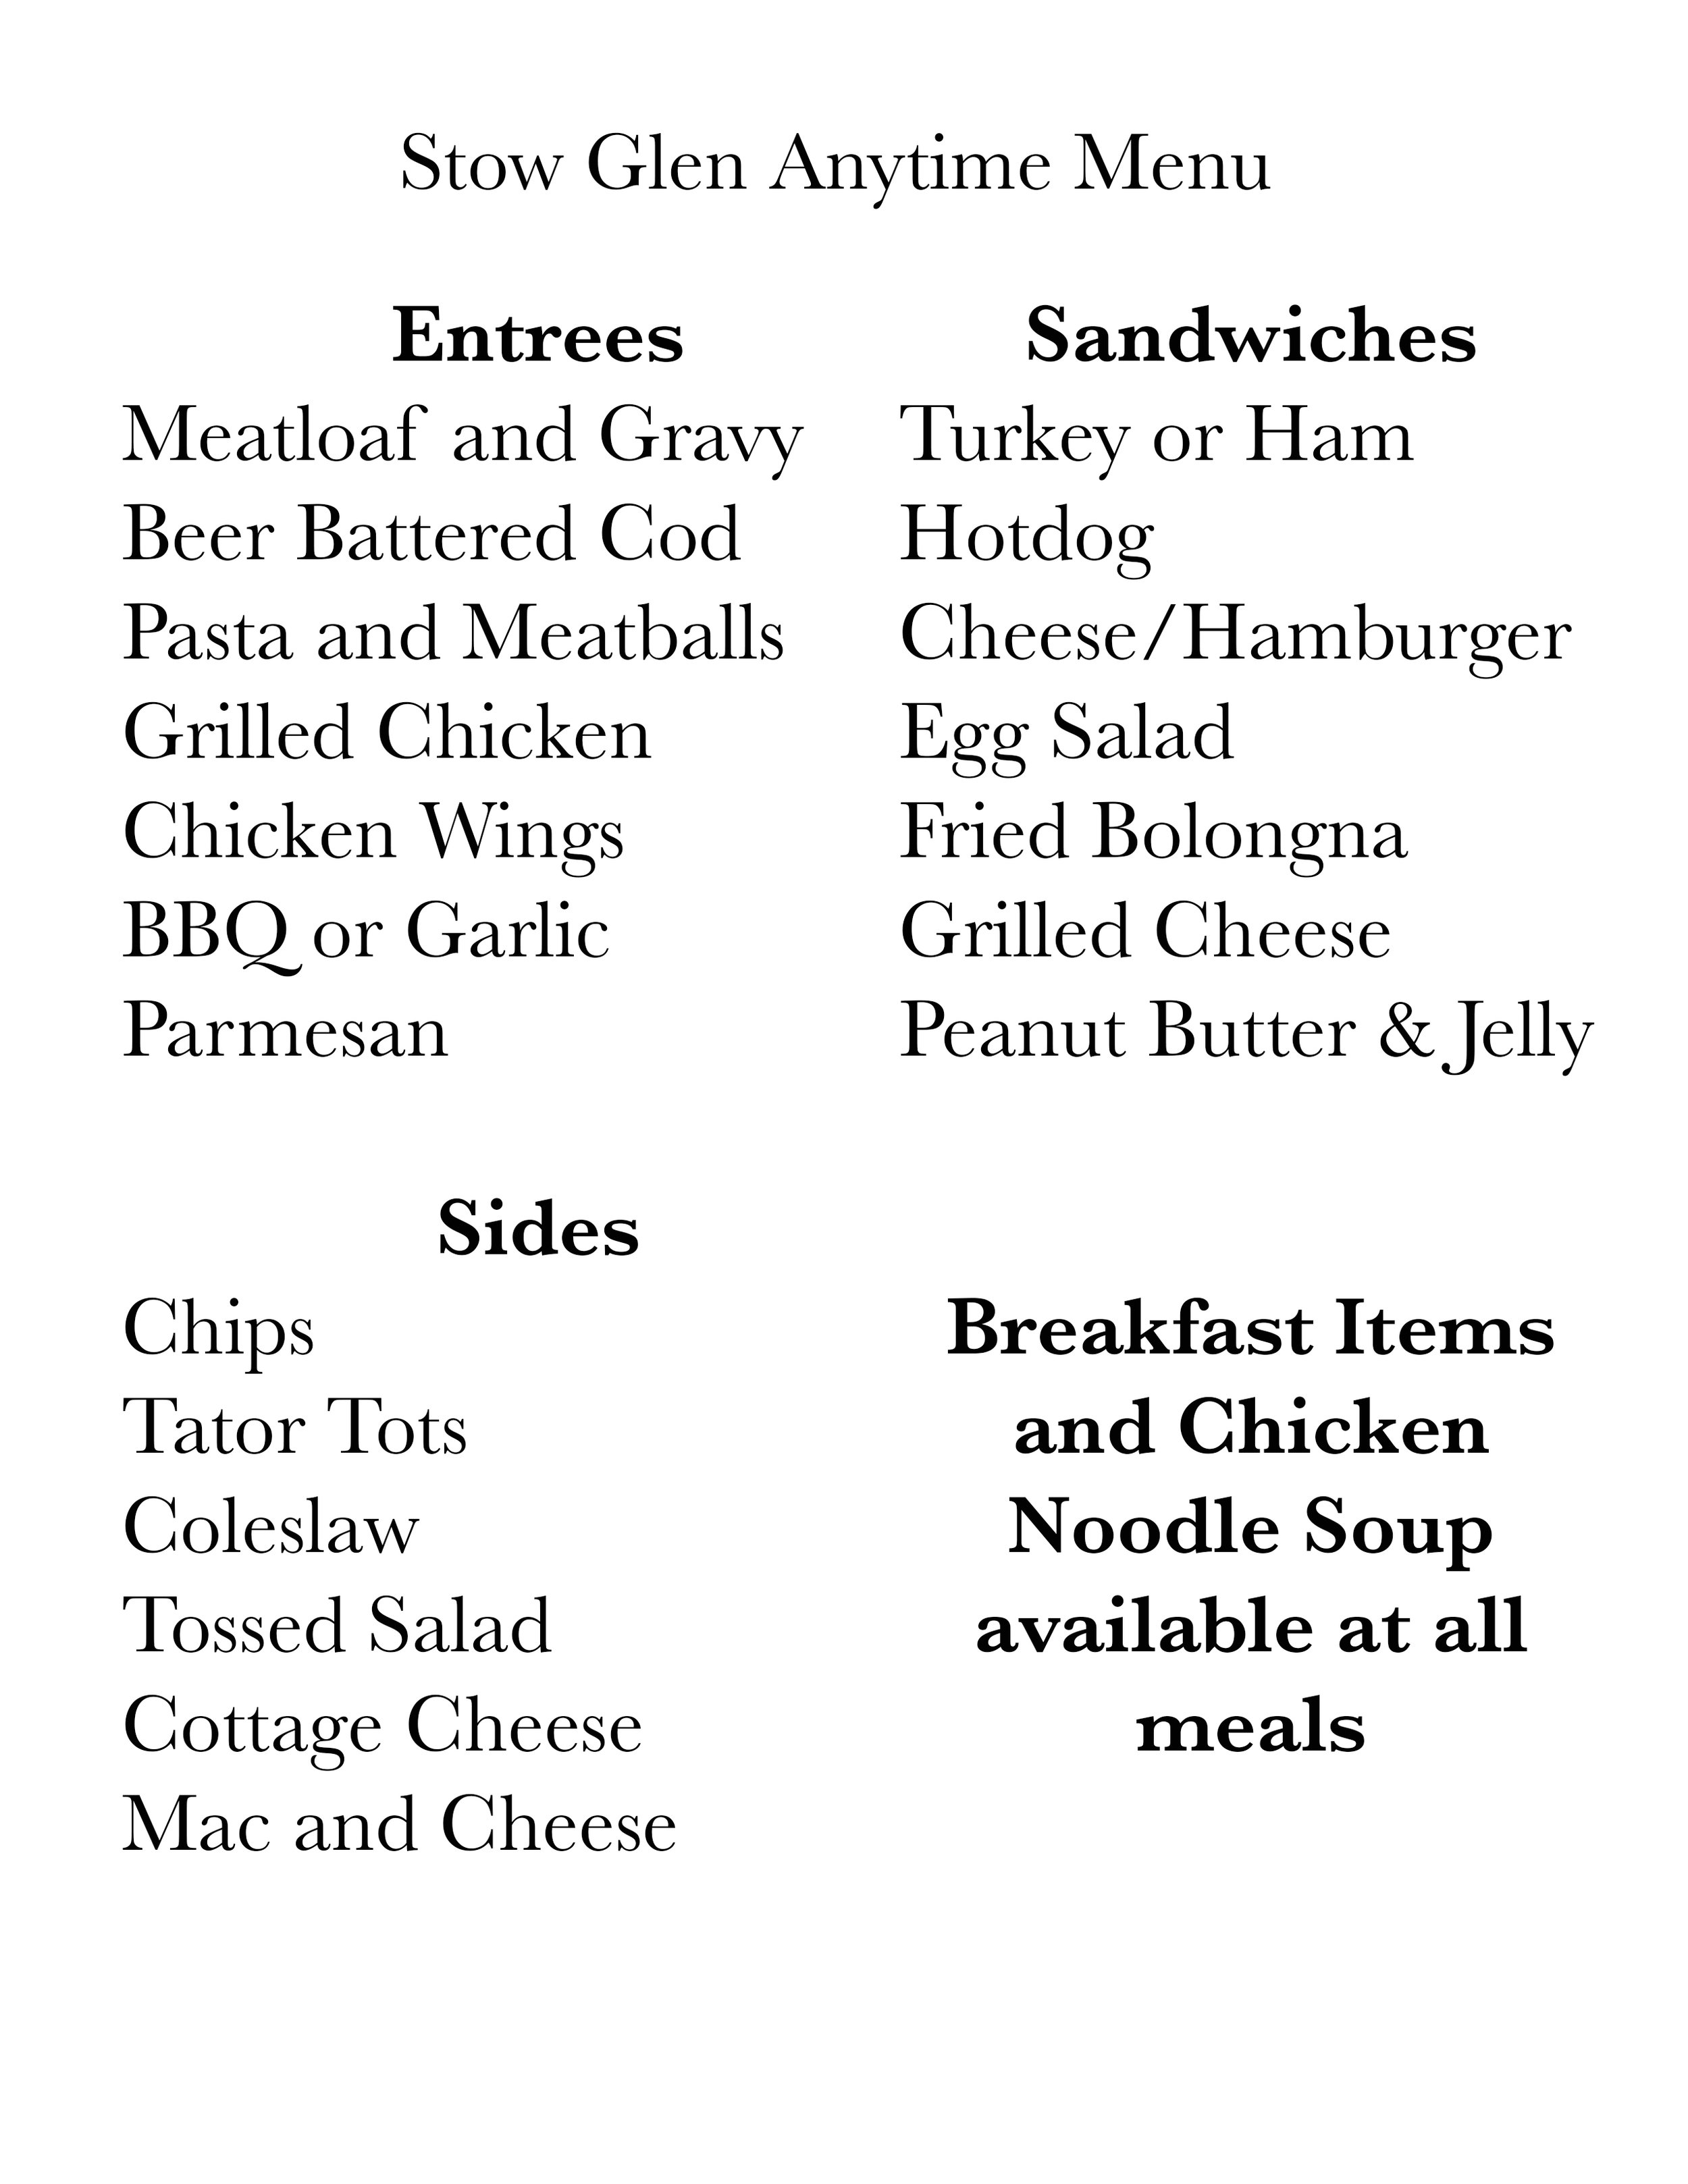 stow glen anytime menu.jpg